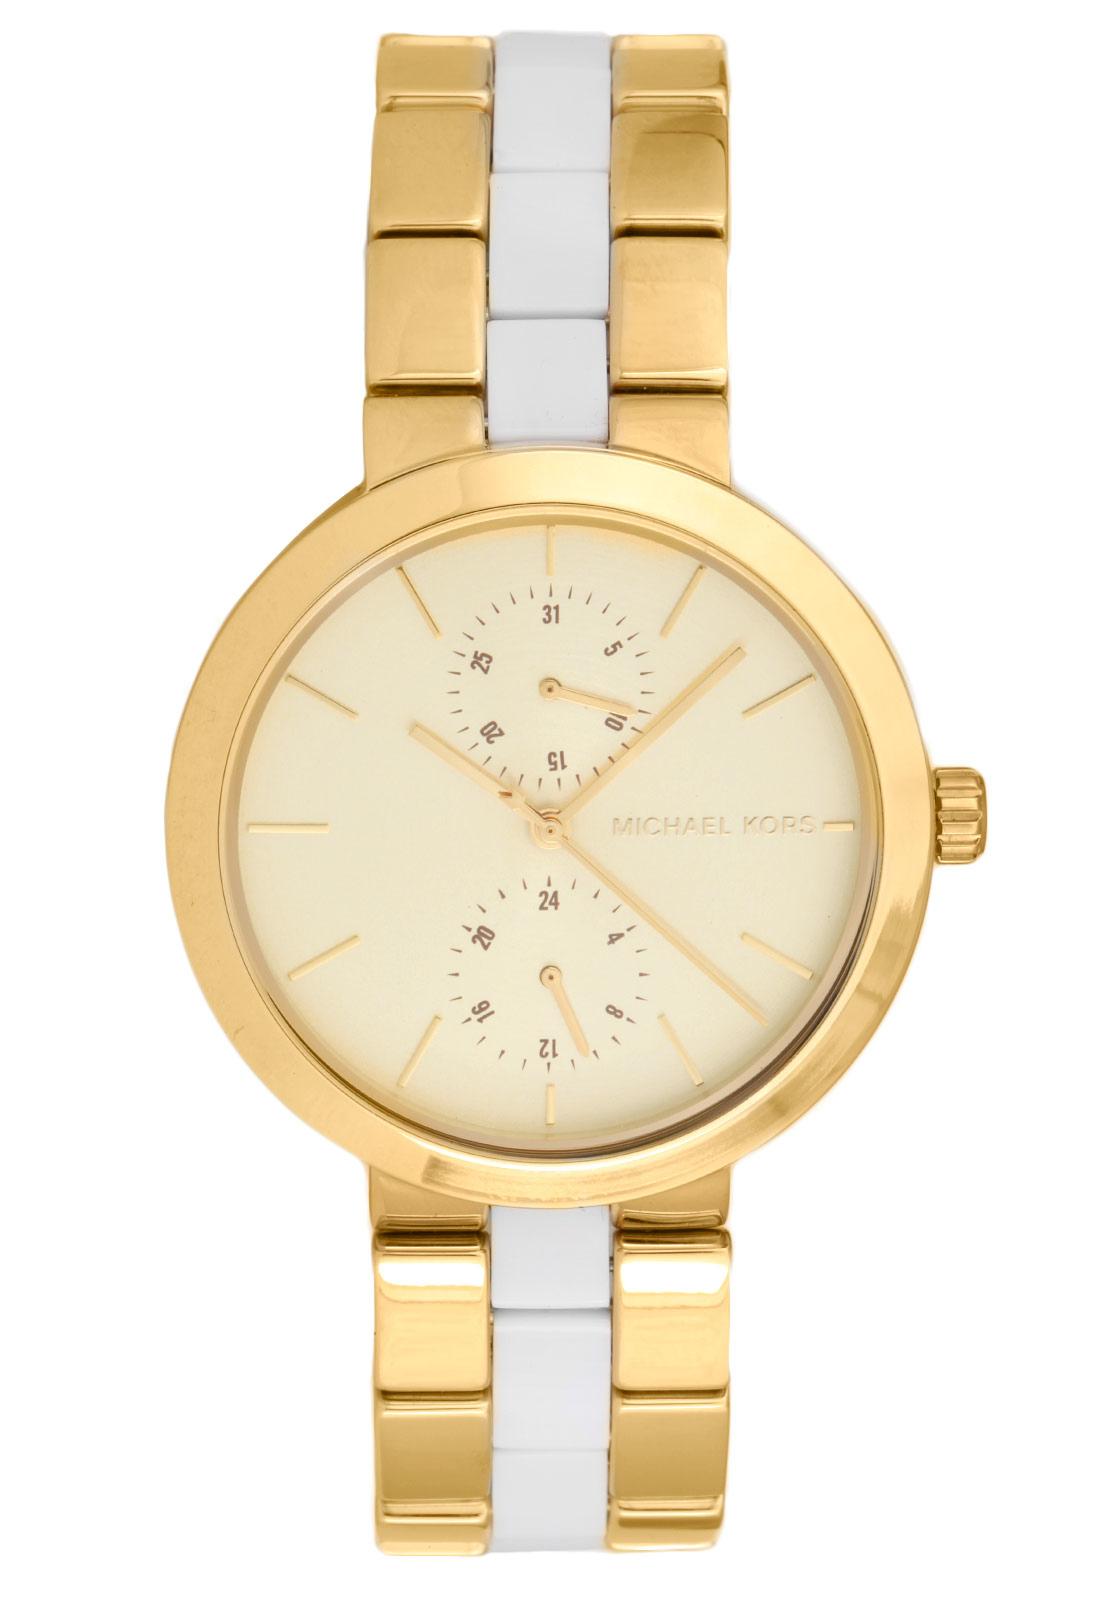 Relógio Michael Kors Feminino Dourado - MK6472/5DN